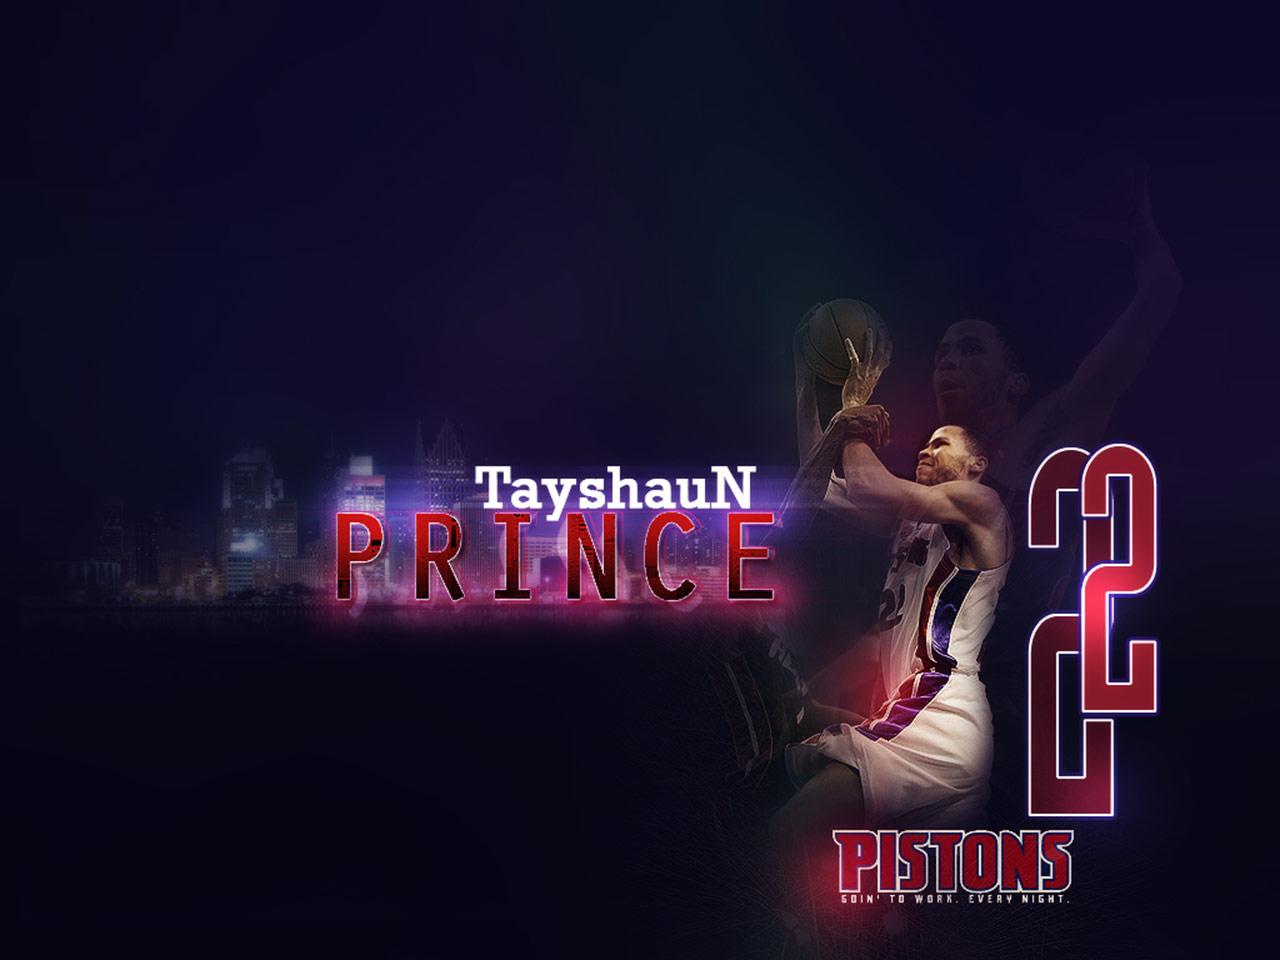 http://4.bp.blogspot.com/-KfDLJn19ARA/Tx55yUapNYI/AAAAAAAAFAs/aJdPV4xXvn8/s1600/Tayshaun-Prince-.jpg